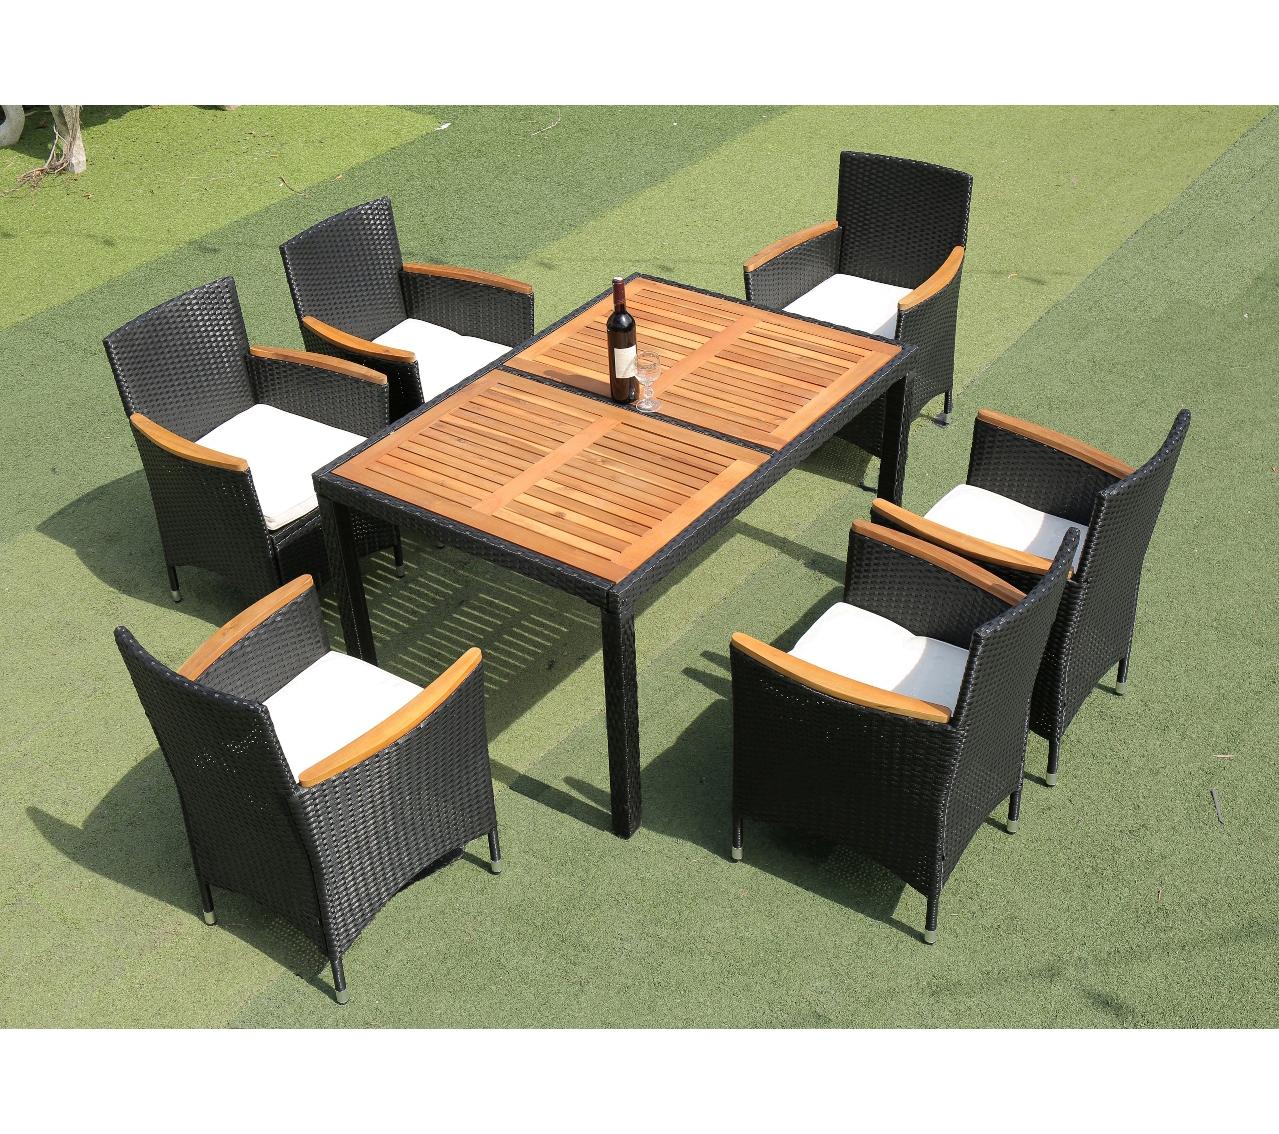 pe poly wicker rattan outdoor garden furniture dining set 6 seater buy rattan outdoor furniture poly rattan furniture outdoor patio furniture product on alibaba com